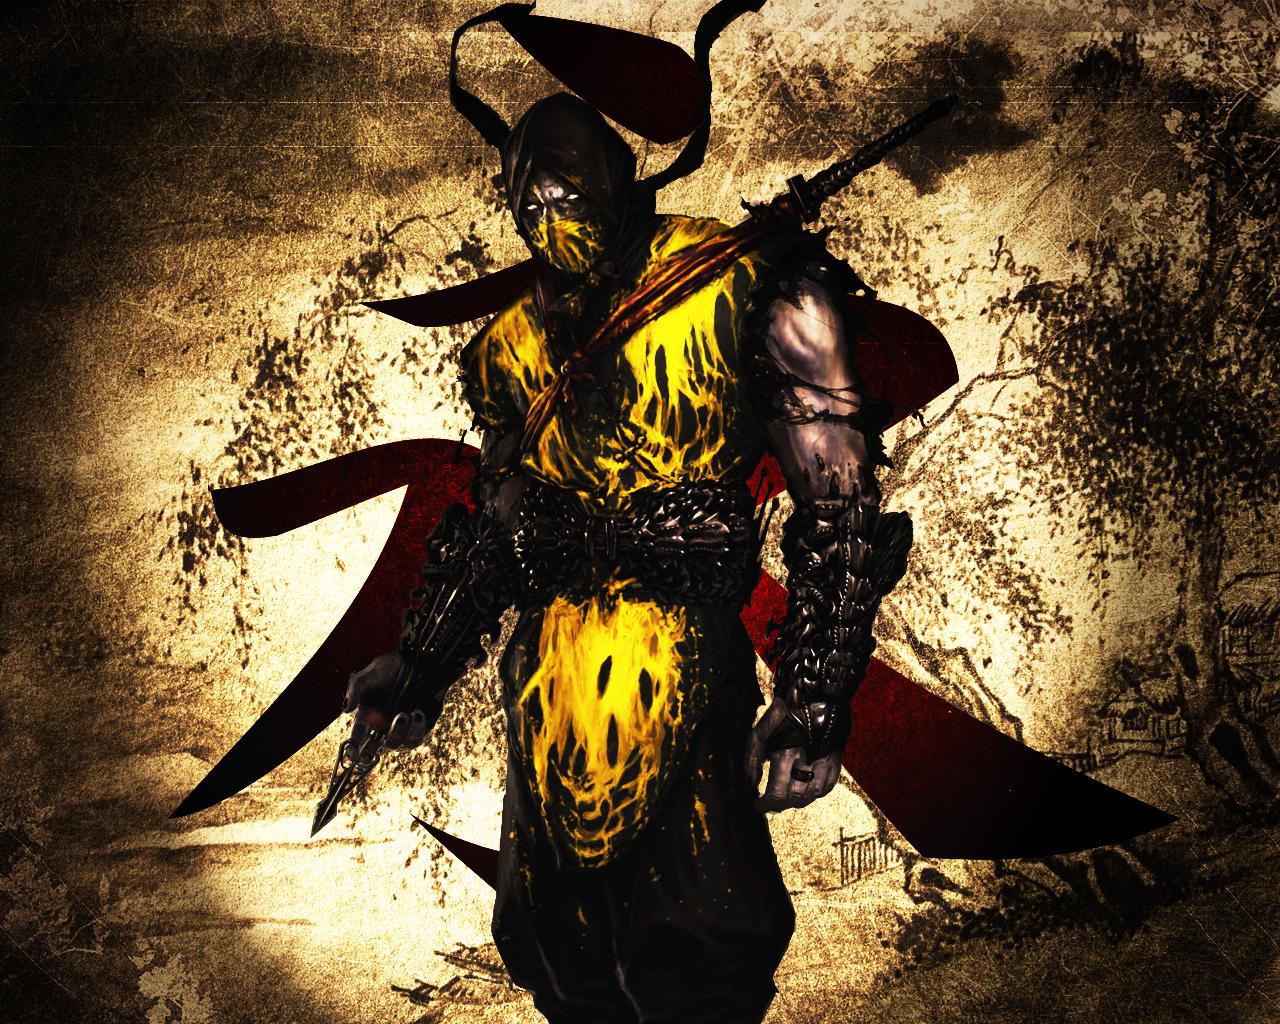 Mortal Kombat Scorpion Wallpaper Cool HD Wallpapers 1280x1024